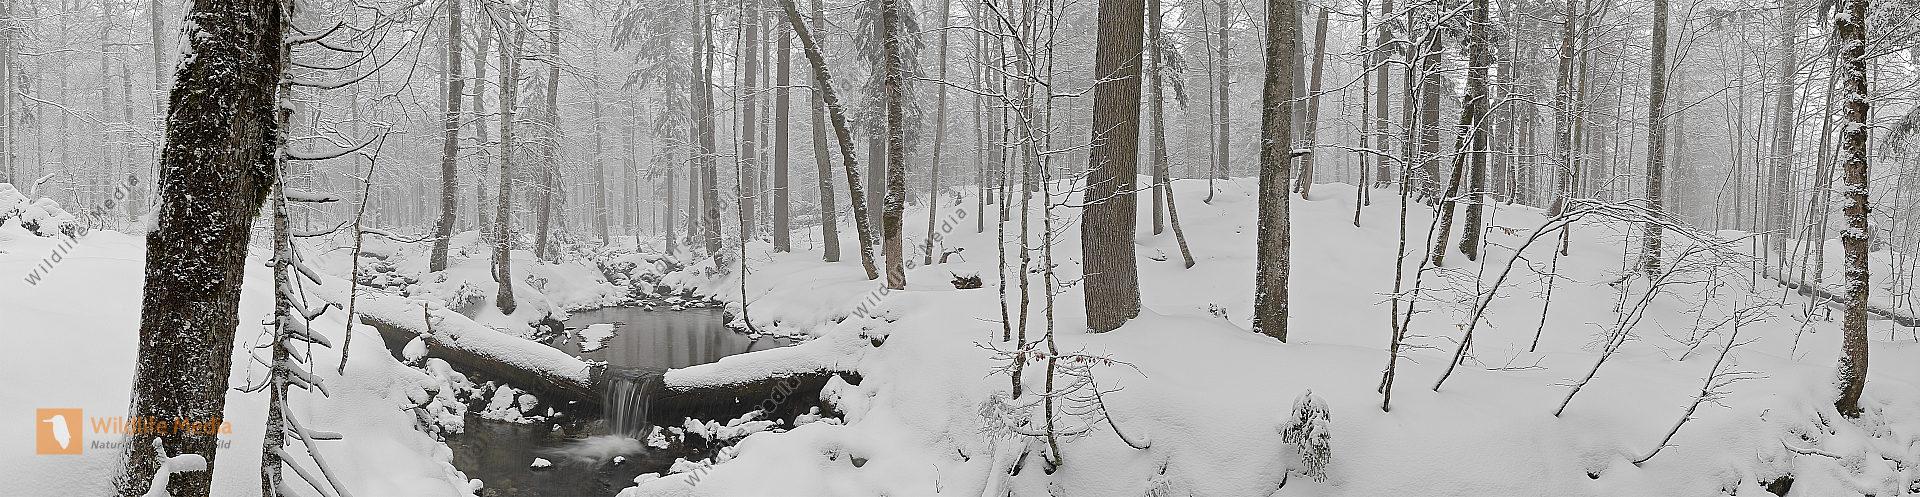 Großer Urwald Winter Panorama